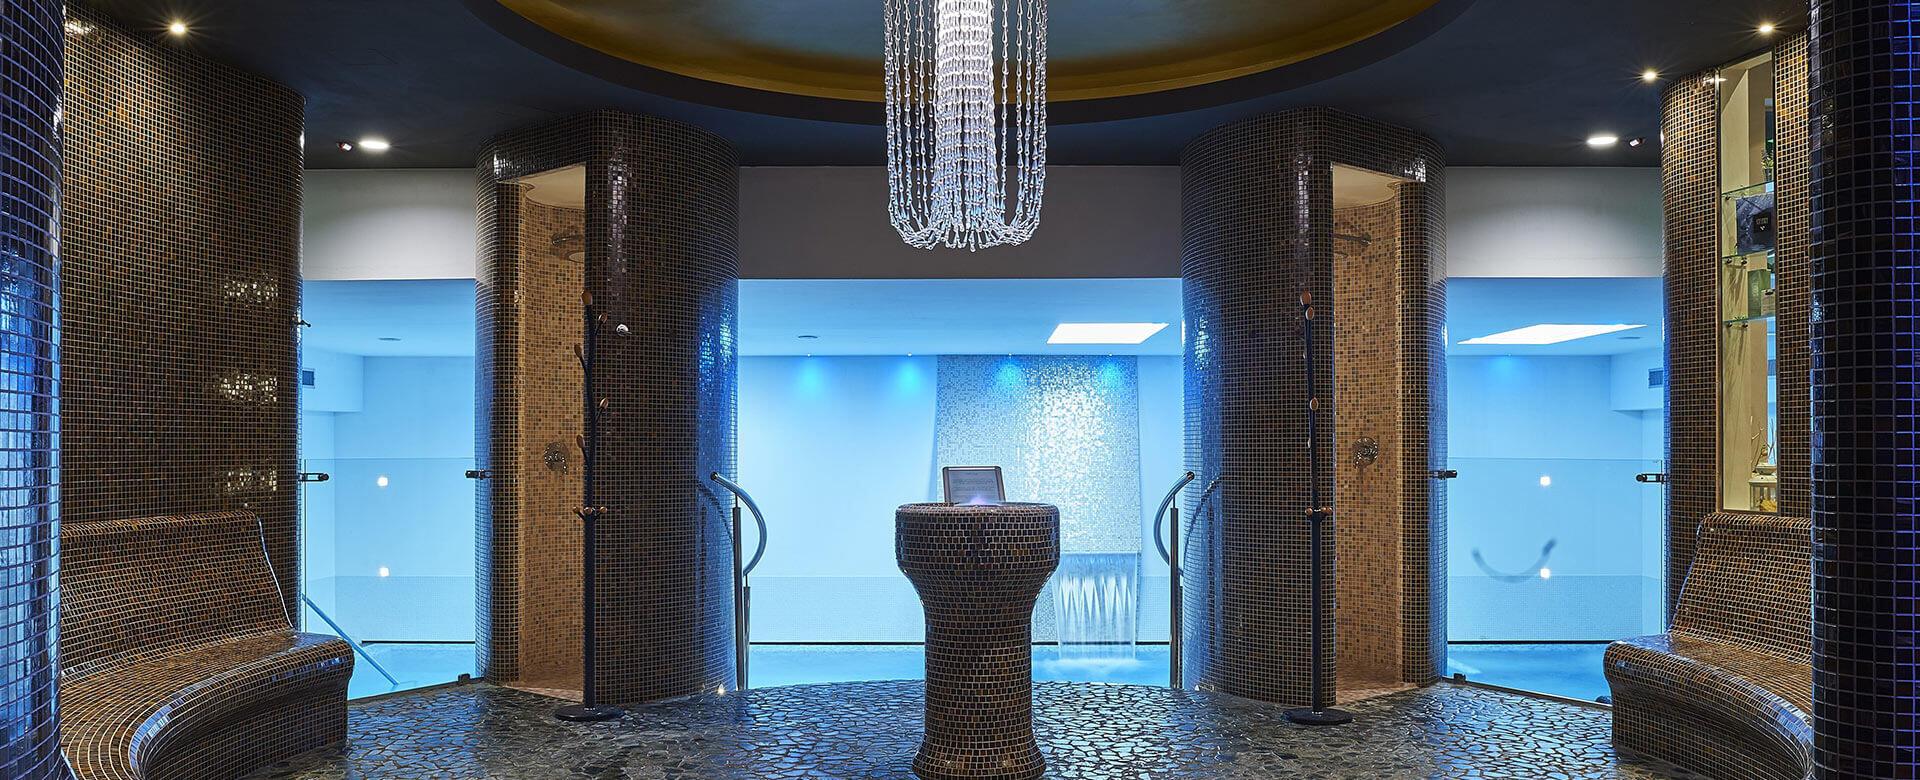 hotelvillaluisa de spa-beauty 003